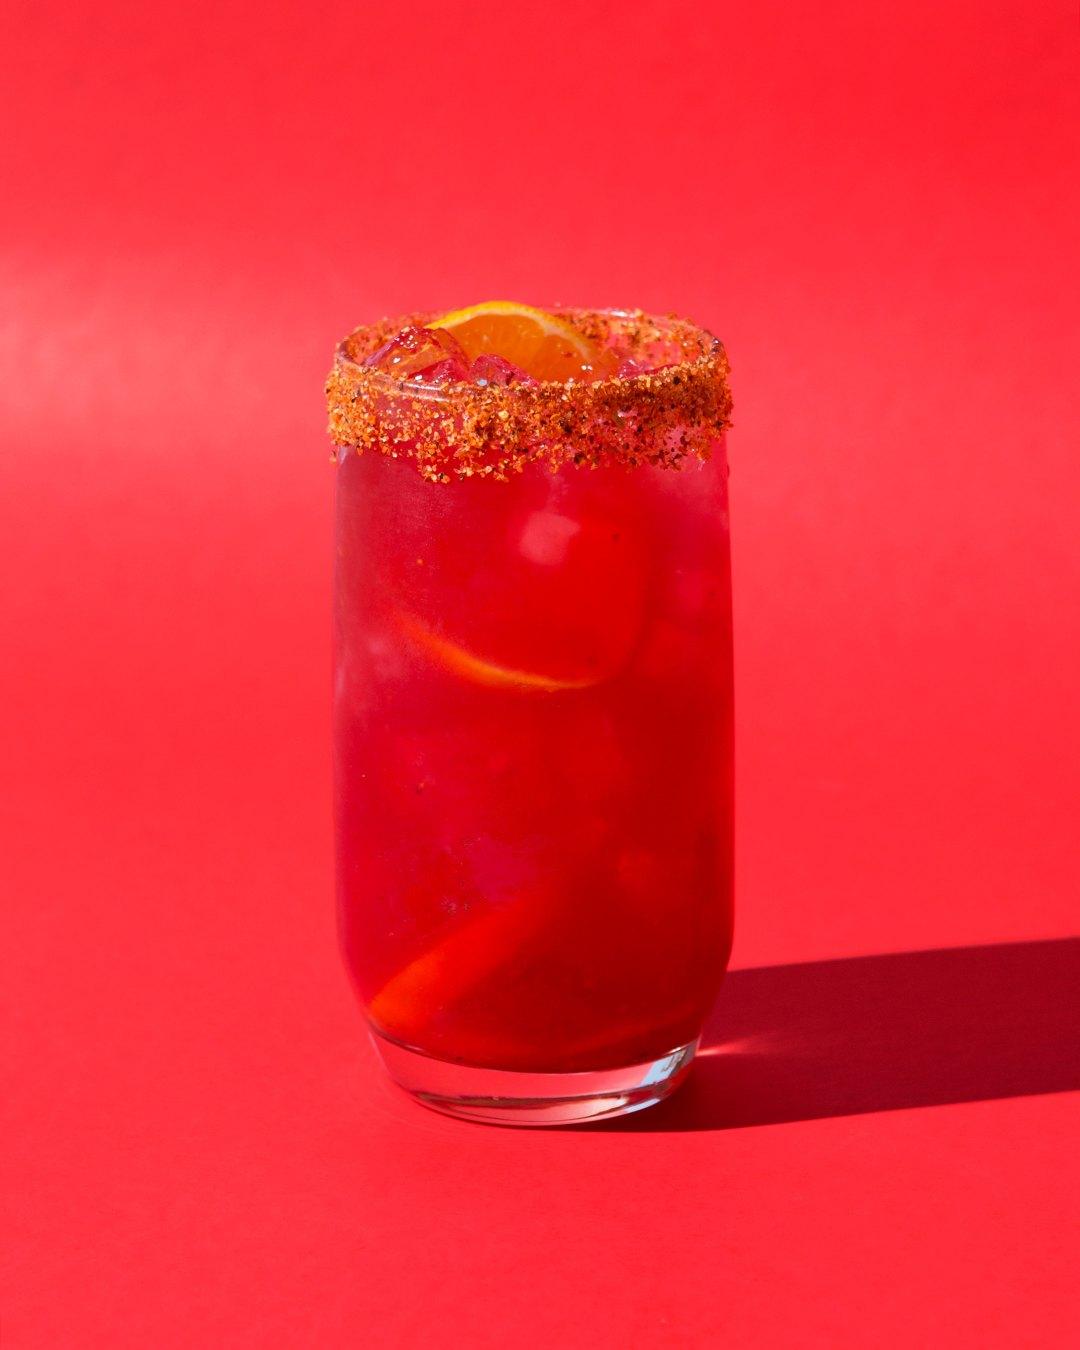 Clementine Margarita with Hibiscus